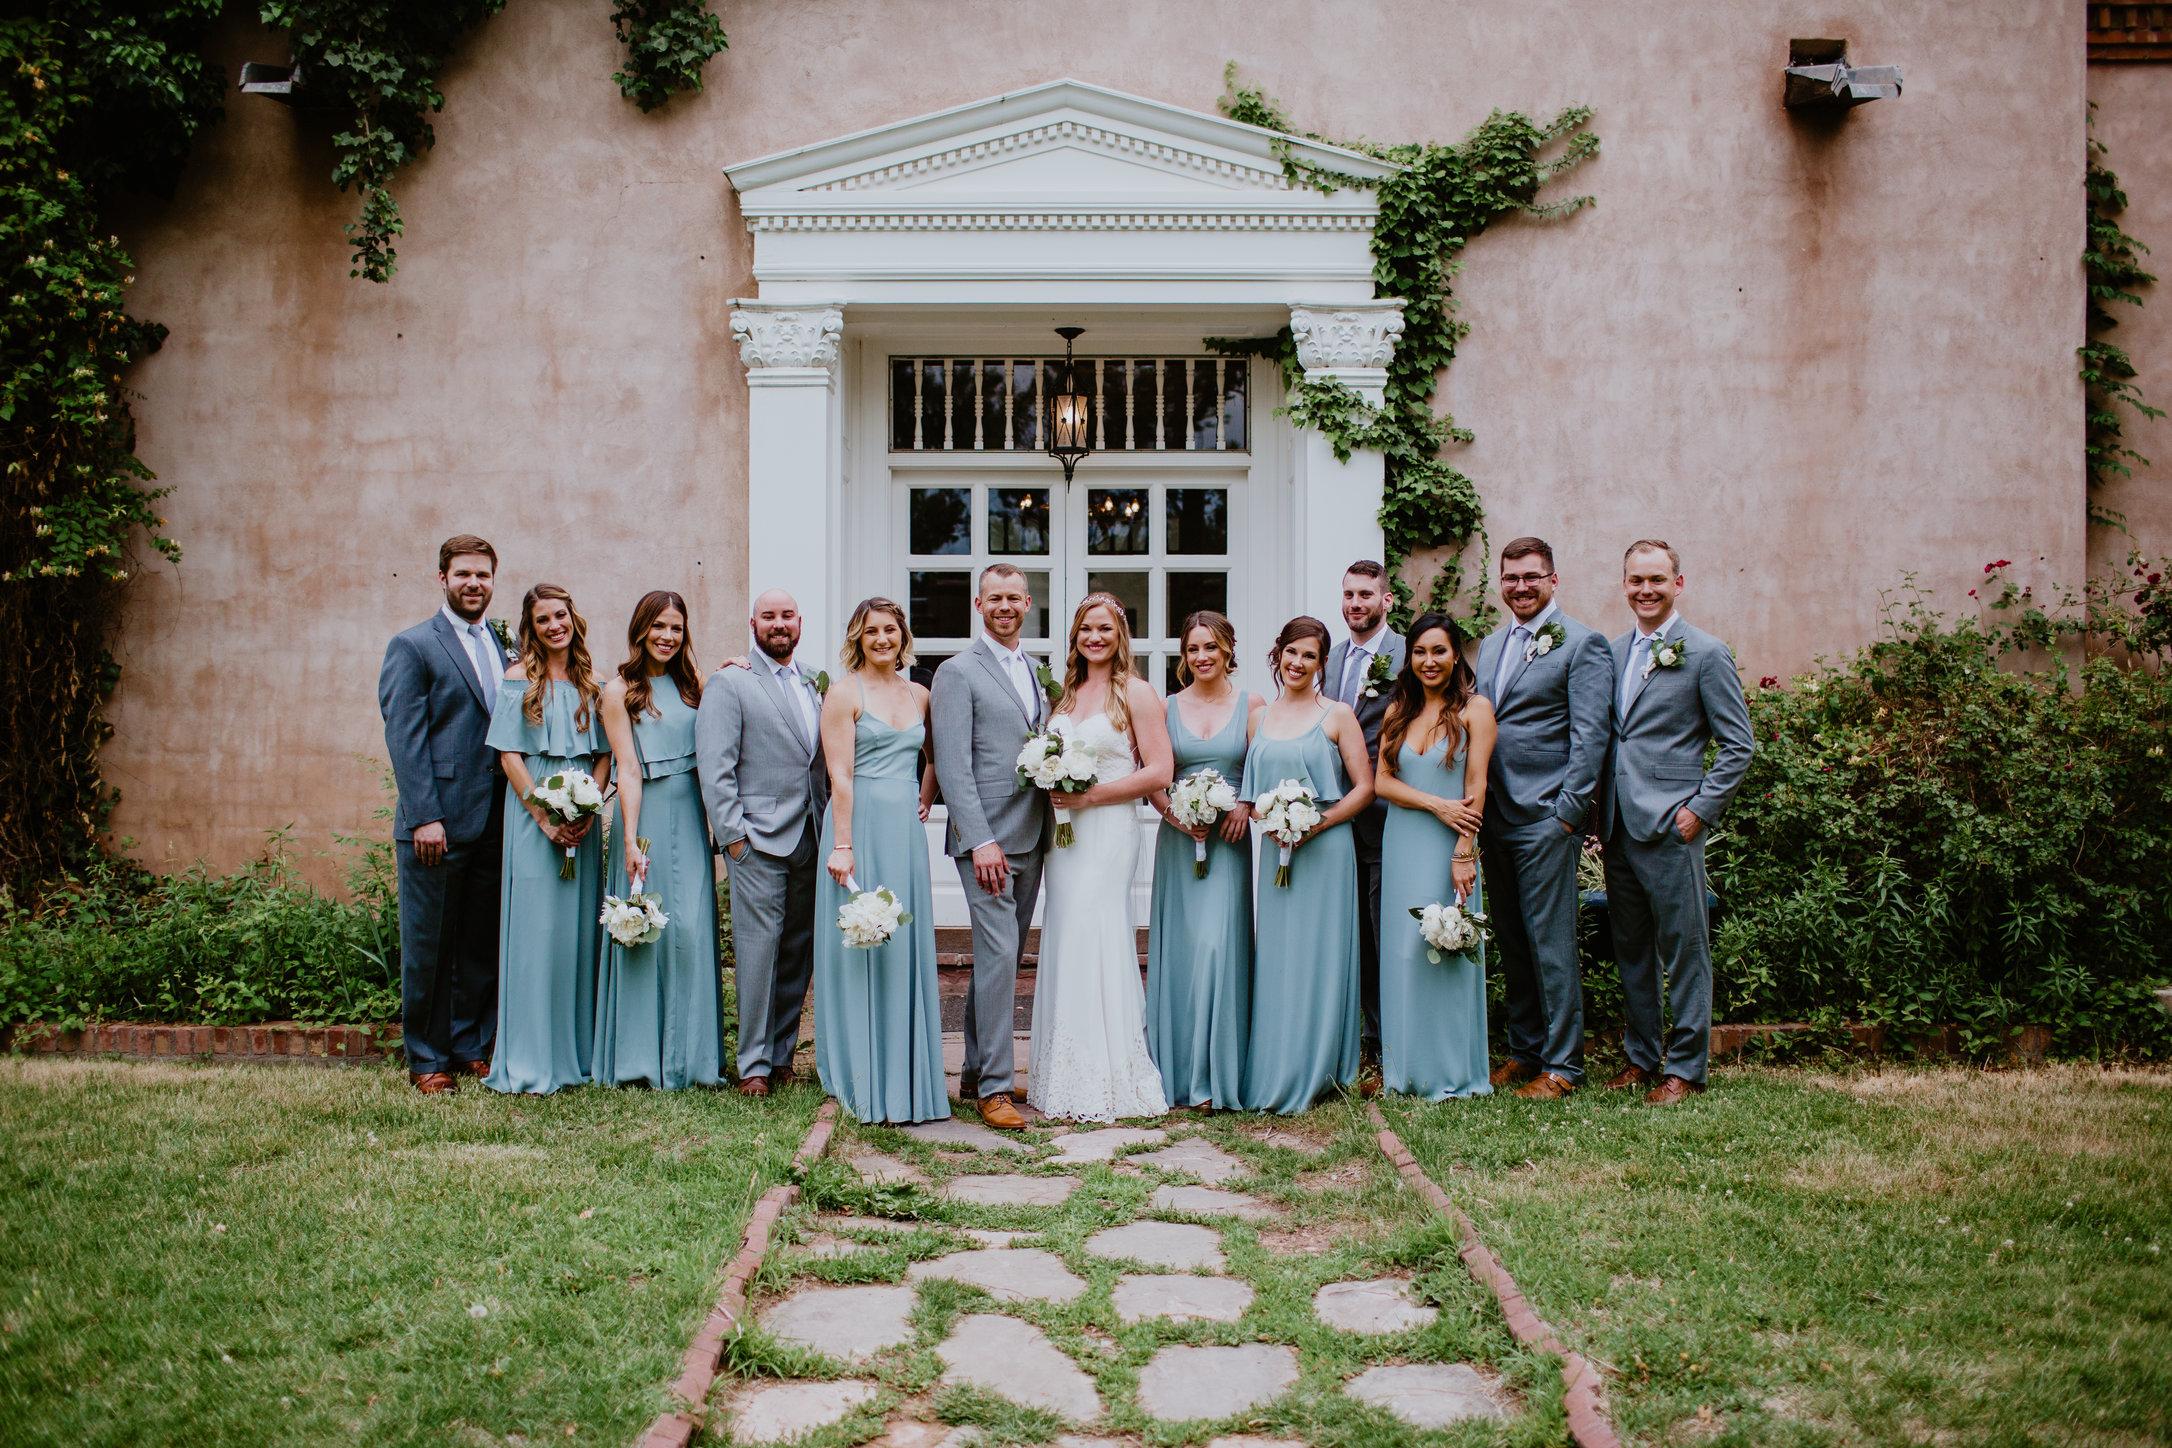 DandA-wedding-414.jpg